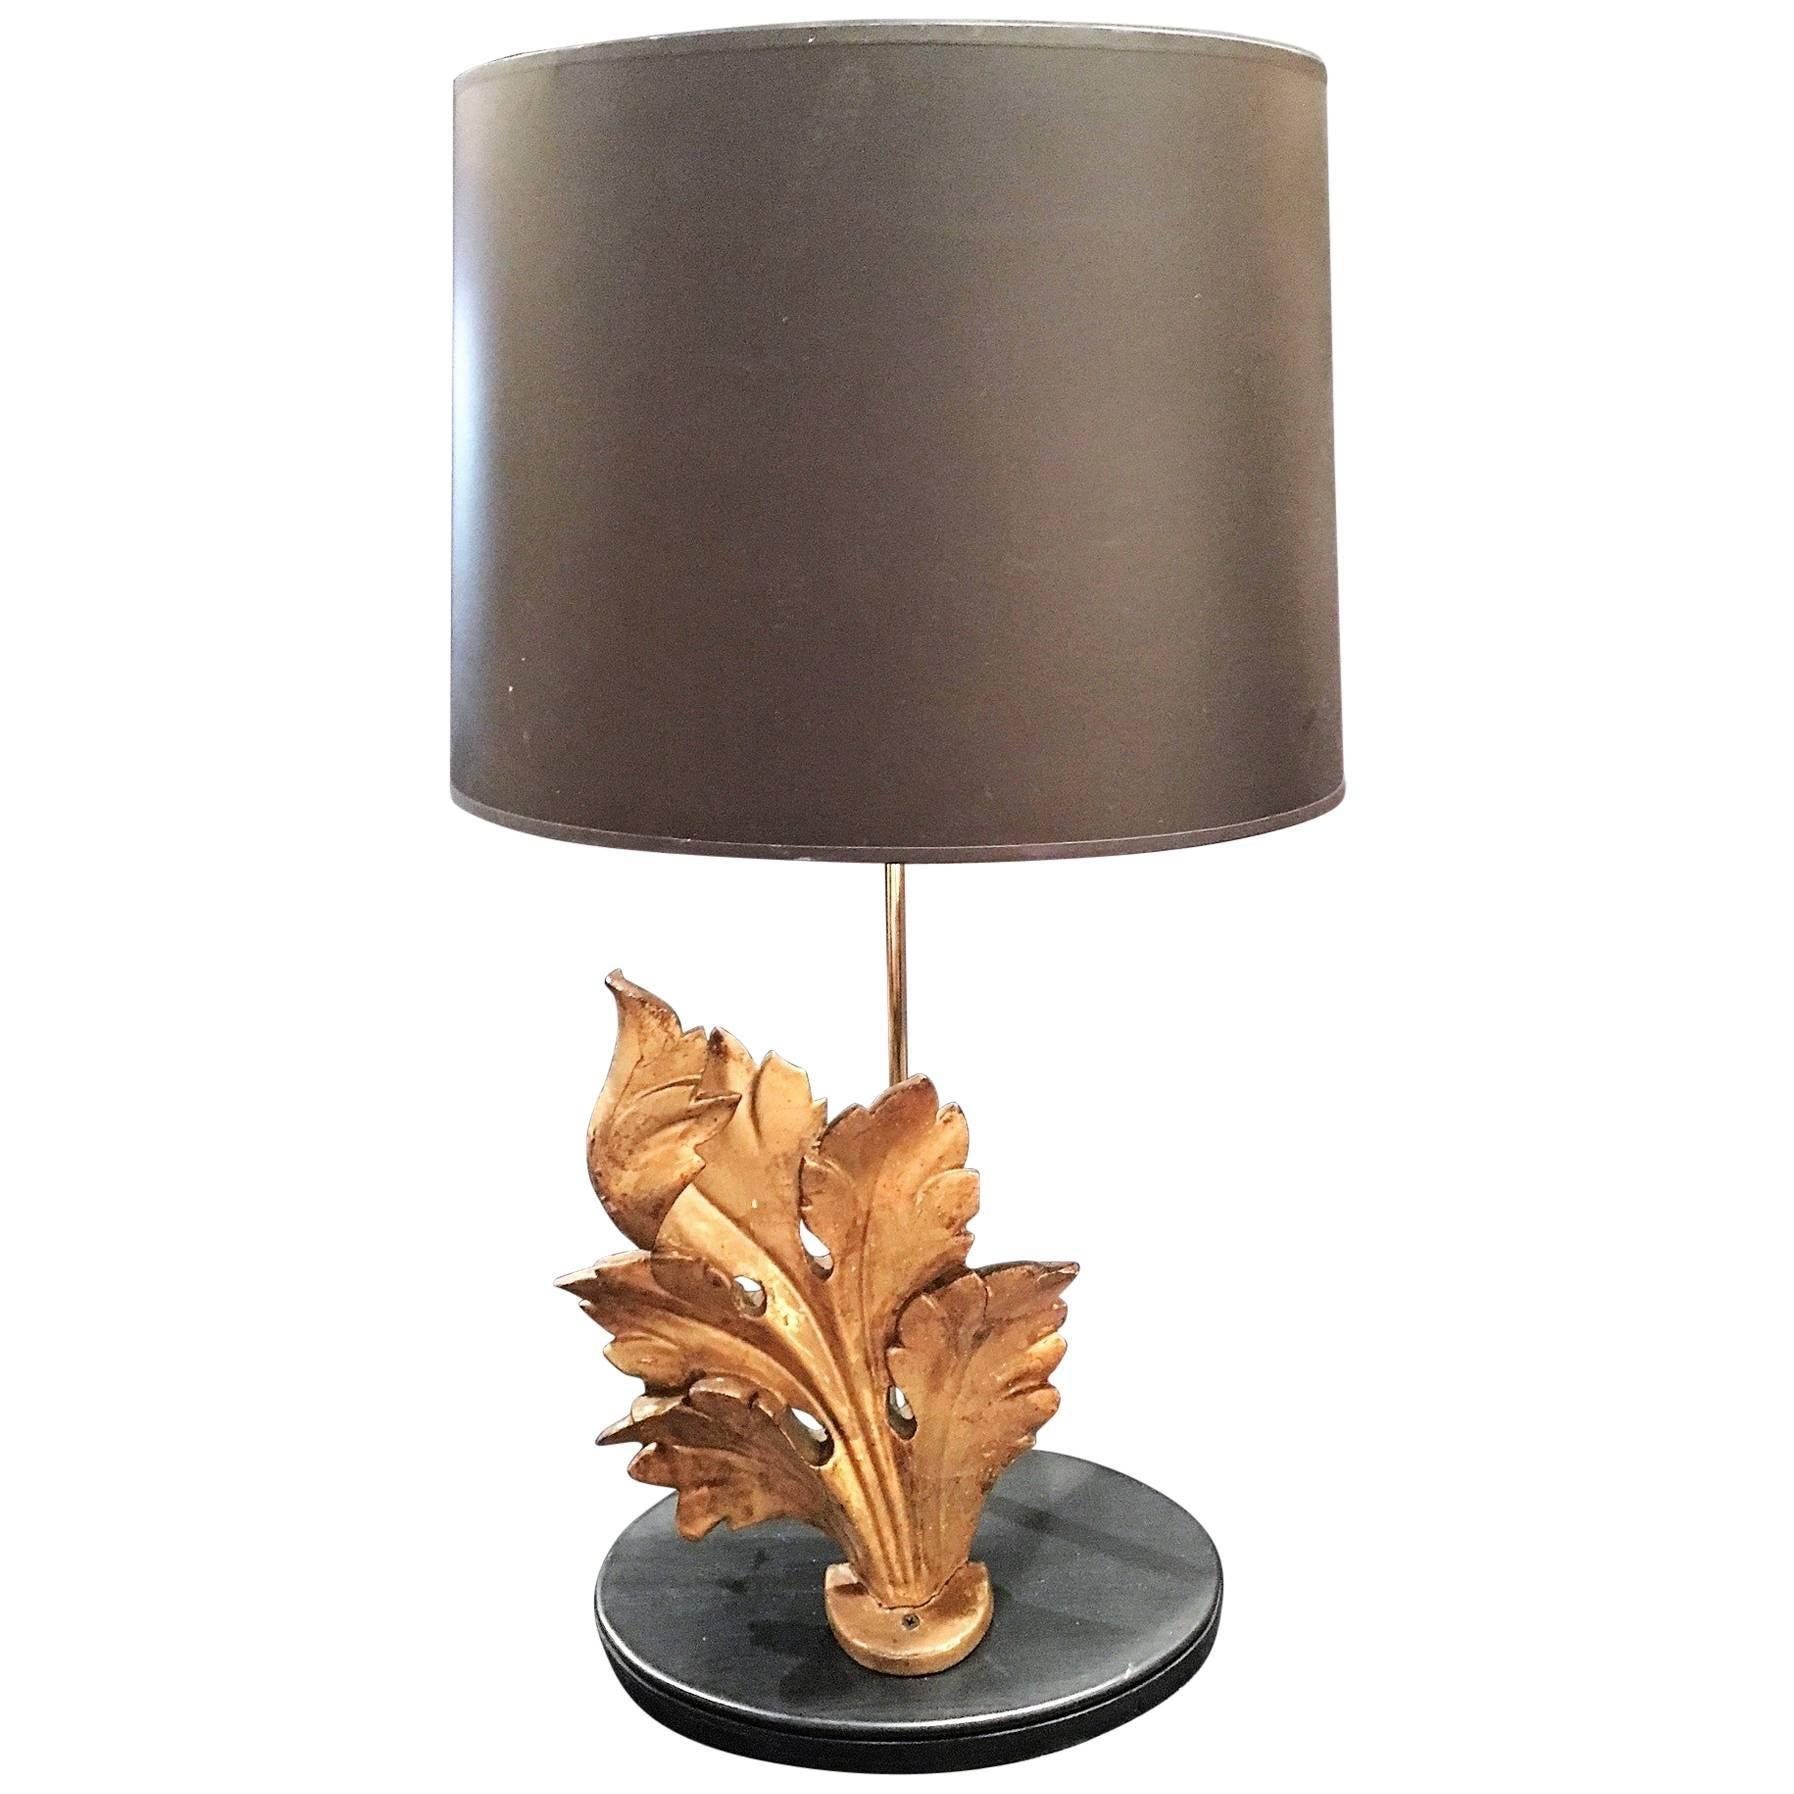 Italian Giltwood Foliate Ornament Adapted as a Lamp, 19th Century